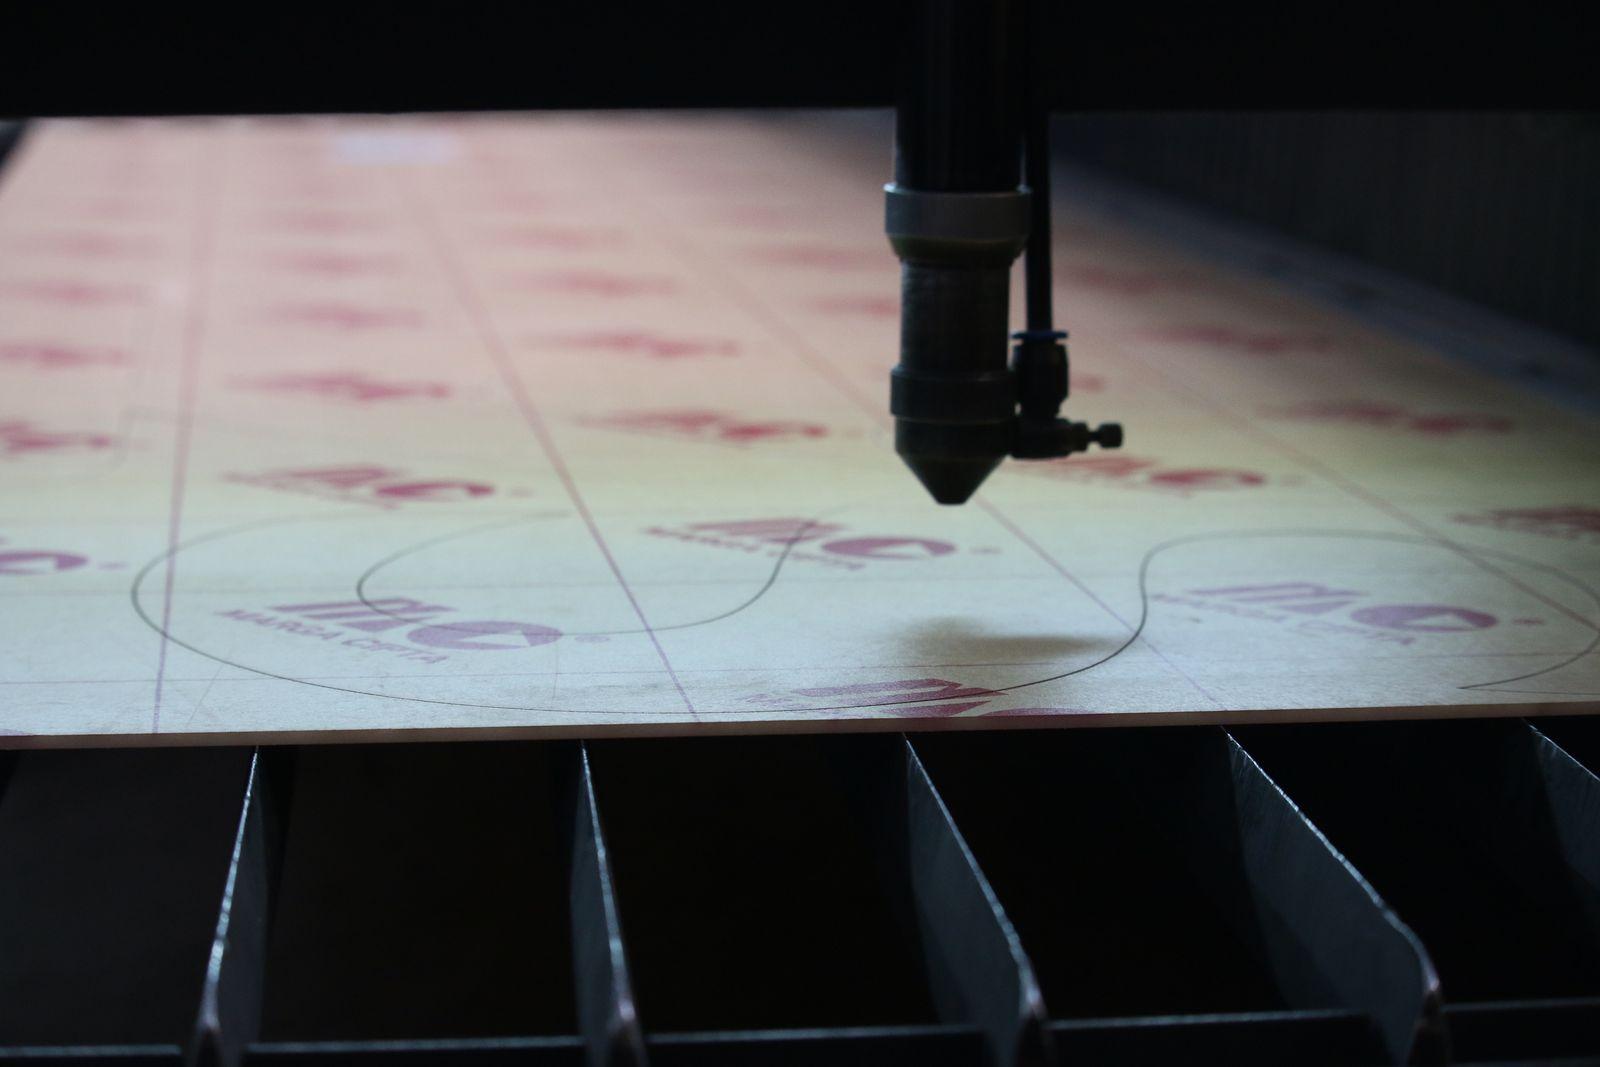 acrylic material cutting